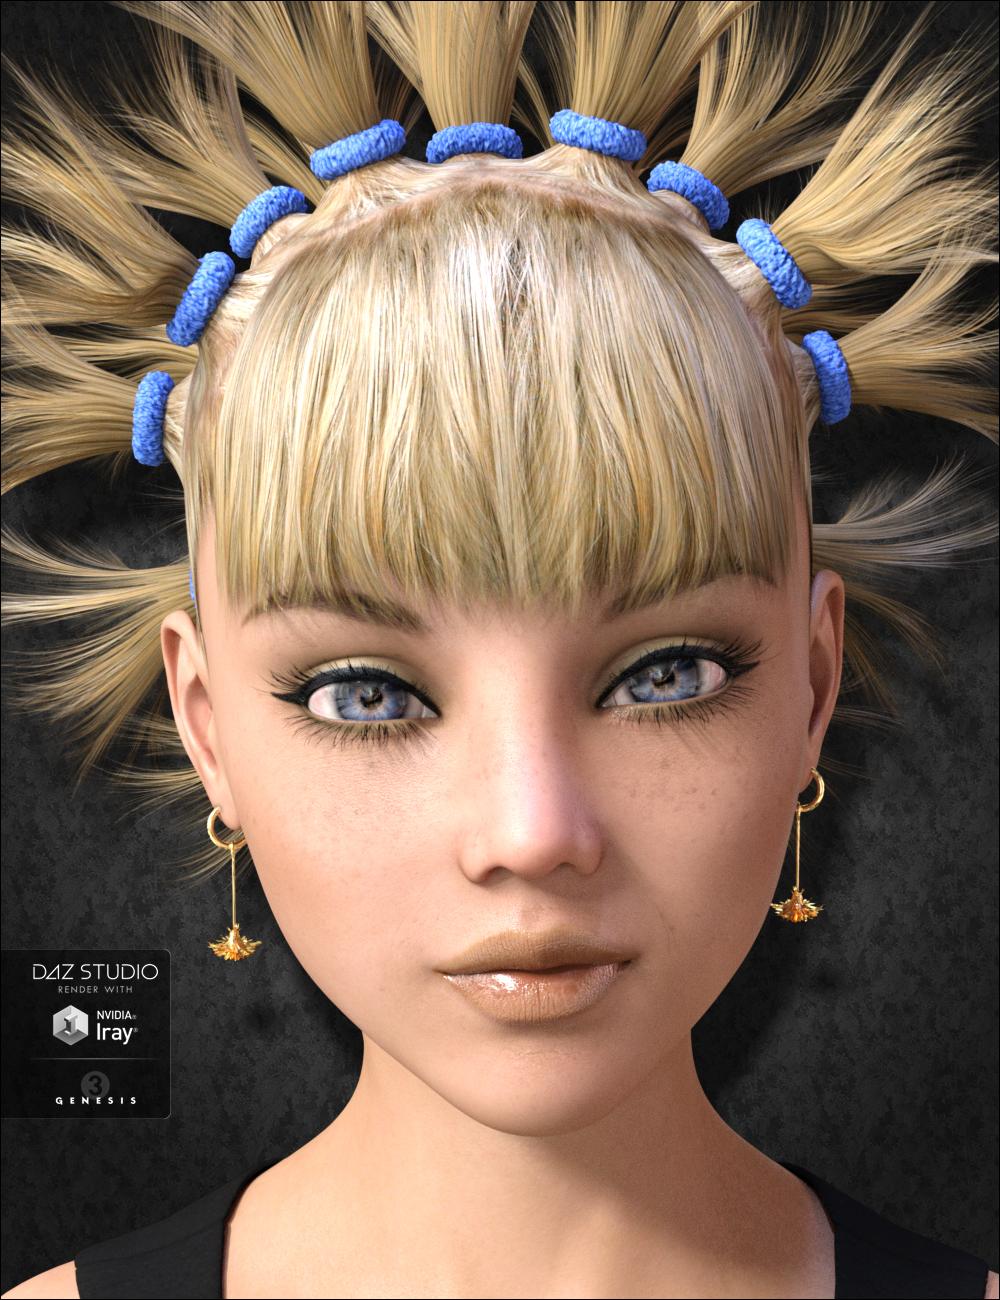 Dandelion Hair by: DarkStarBurningMindVision G.D.S., 3D Models by Daz 3D